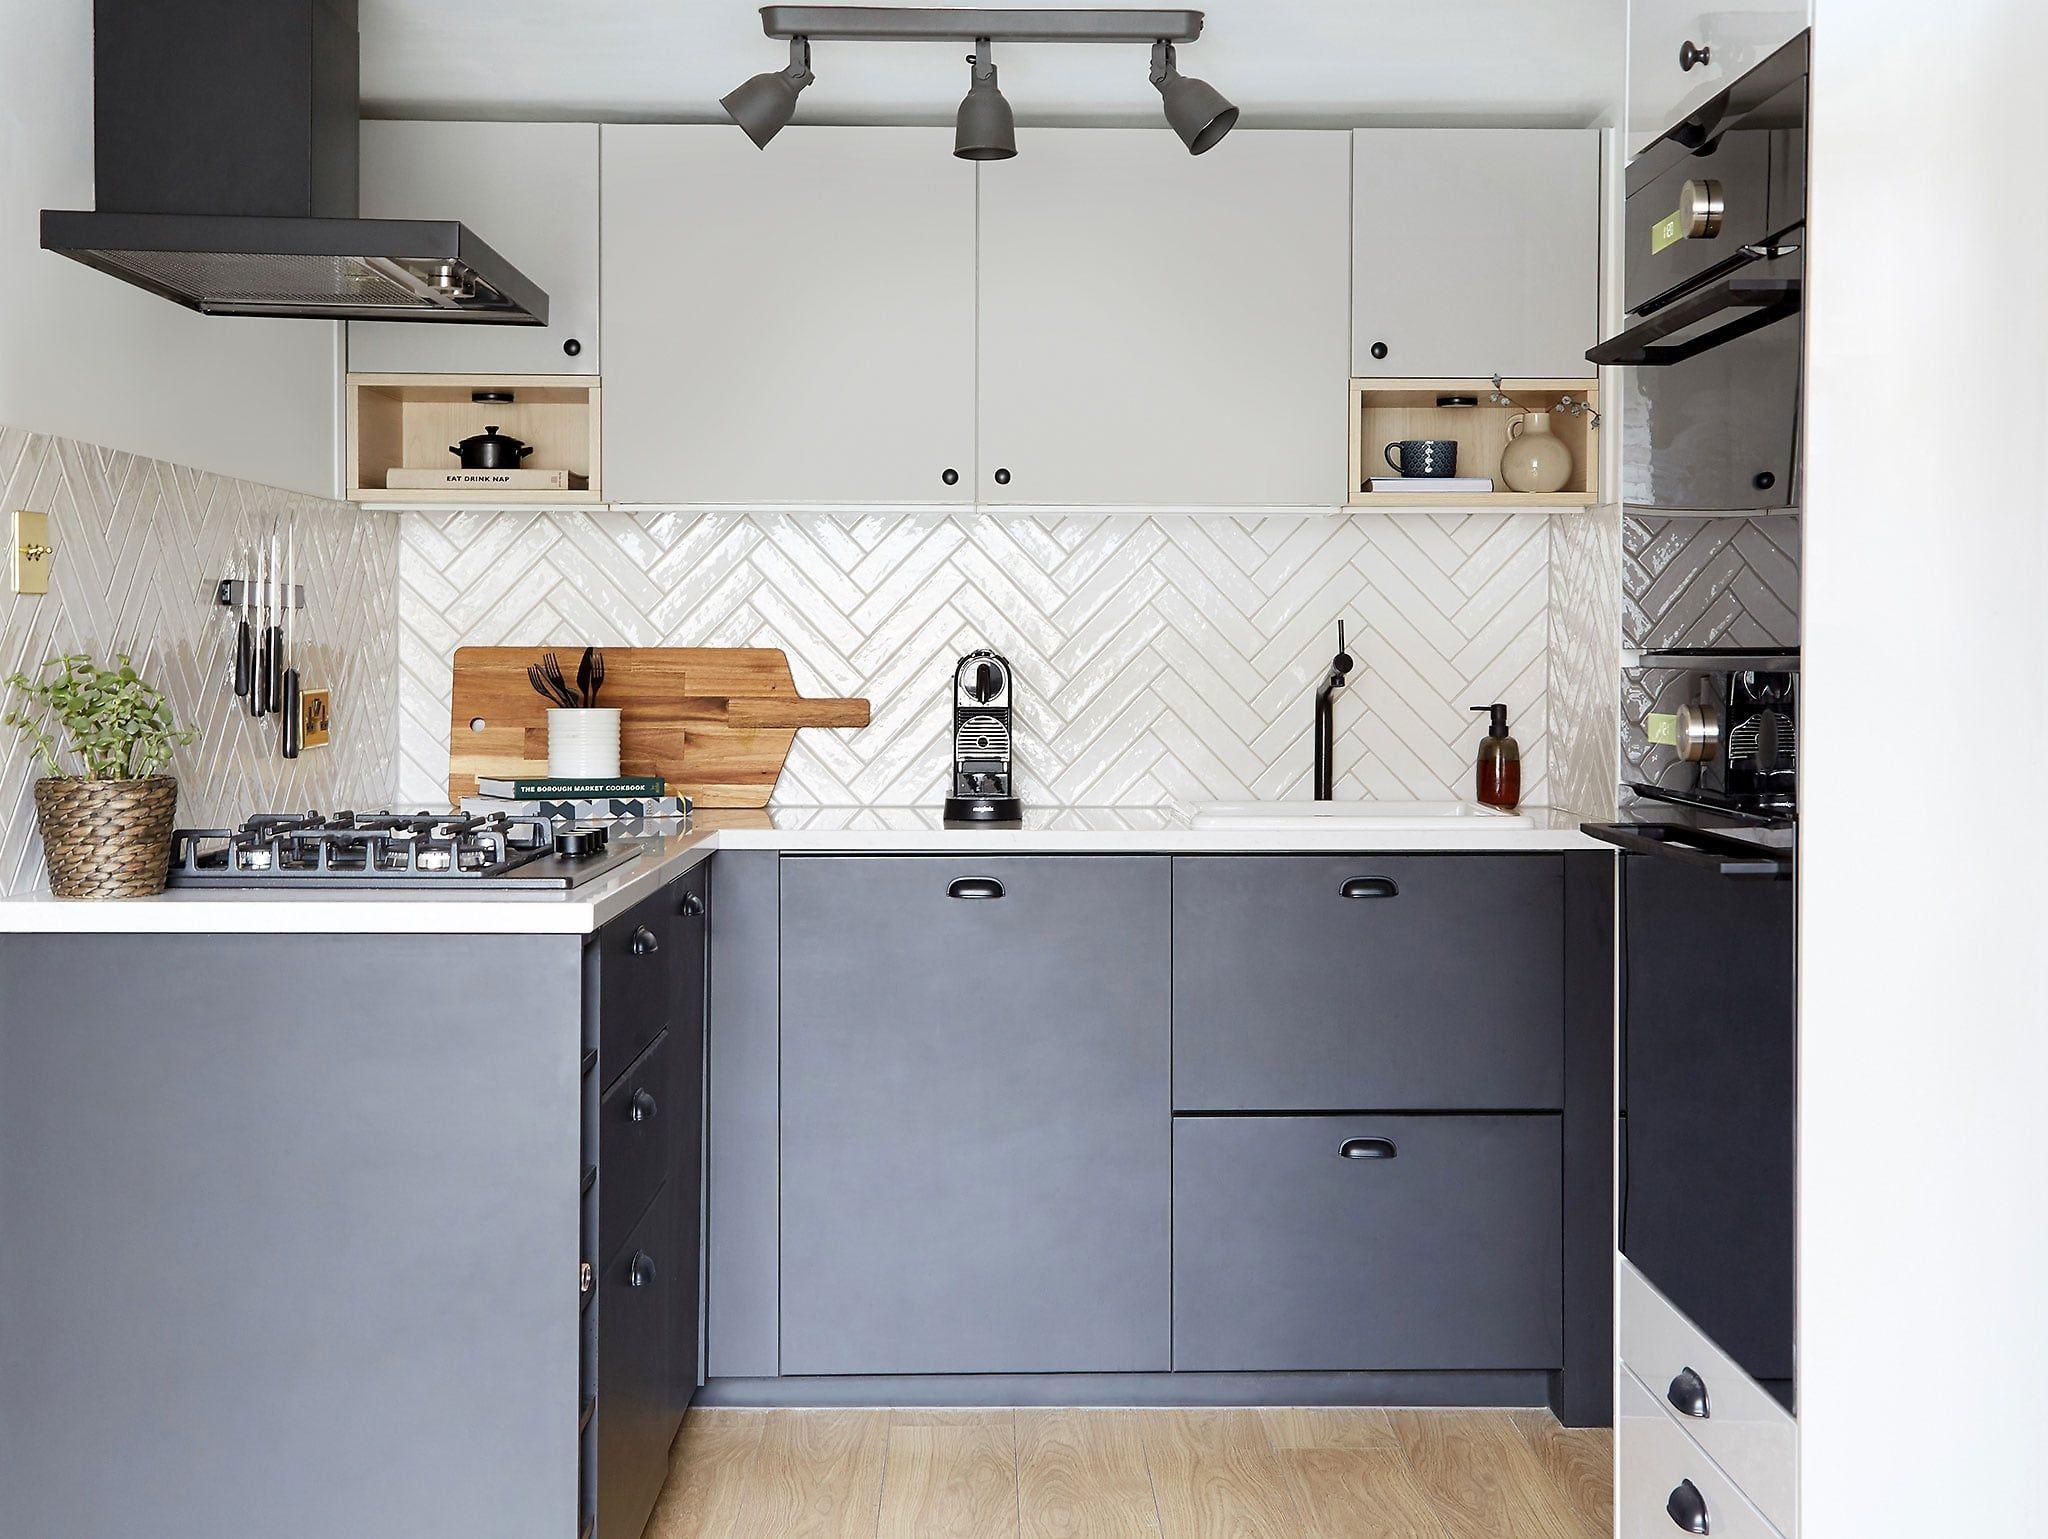 Alternative To A Monochrome Kitchen Ikea Kitchen Ikea Kitchen Inspiration Kitchen Plans